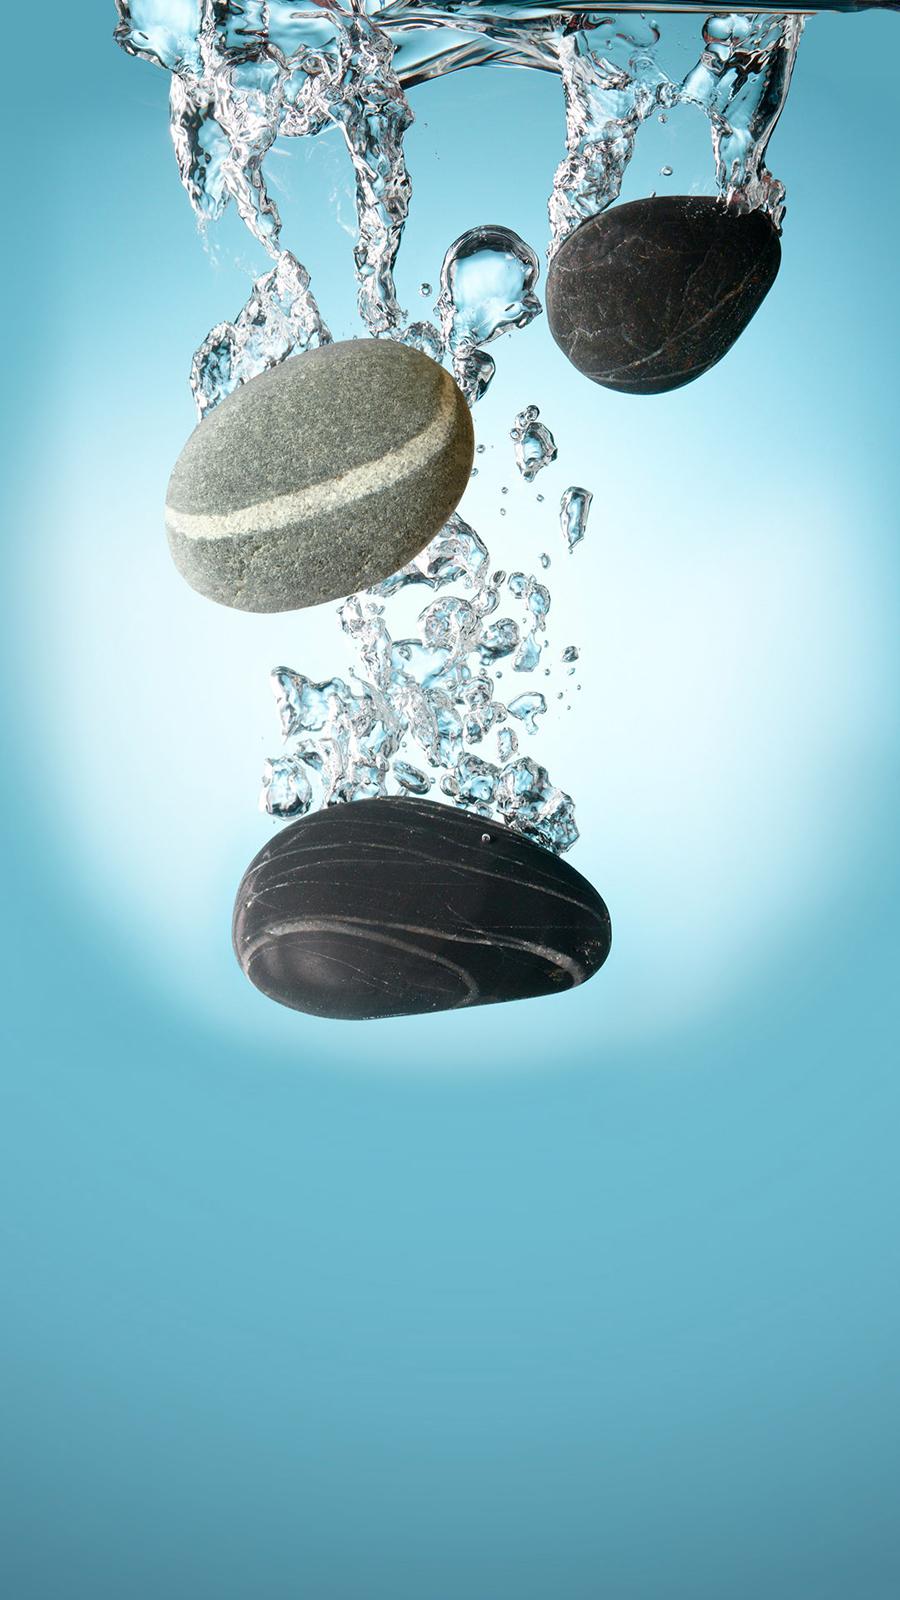 Black Pebbles Water Full HD Wallpapers Download